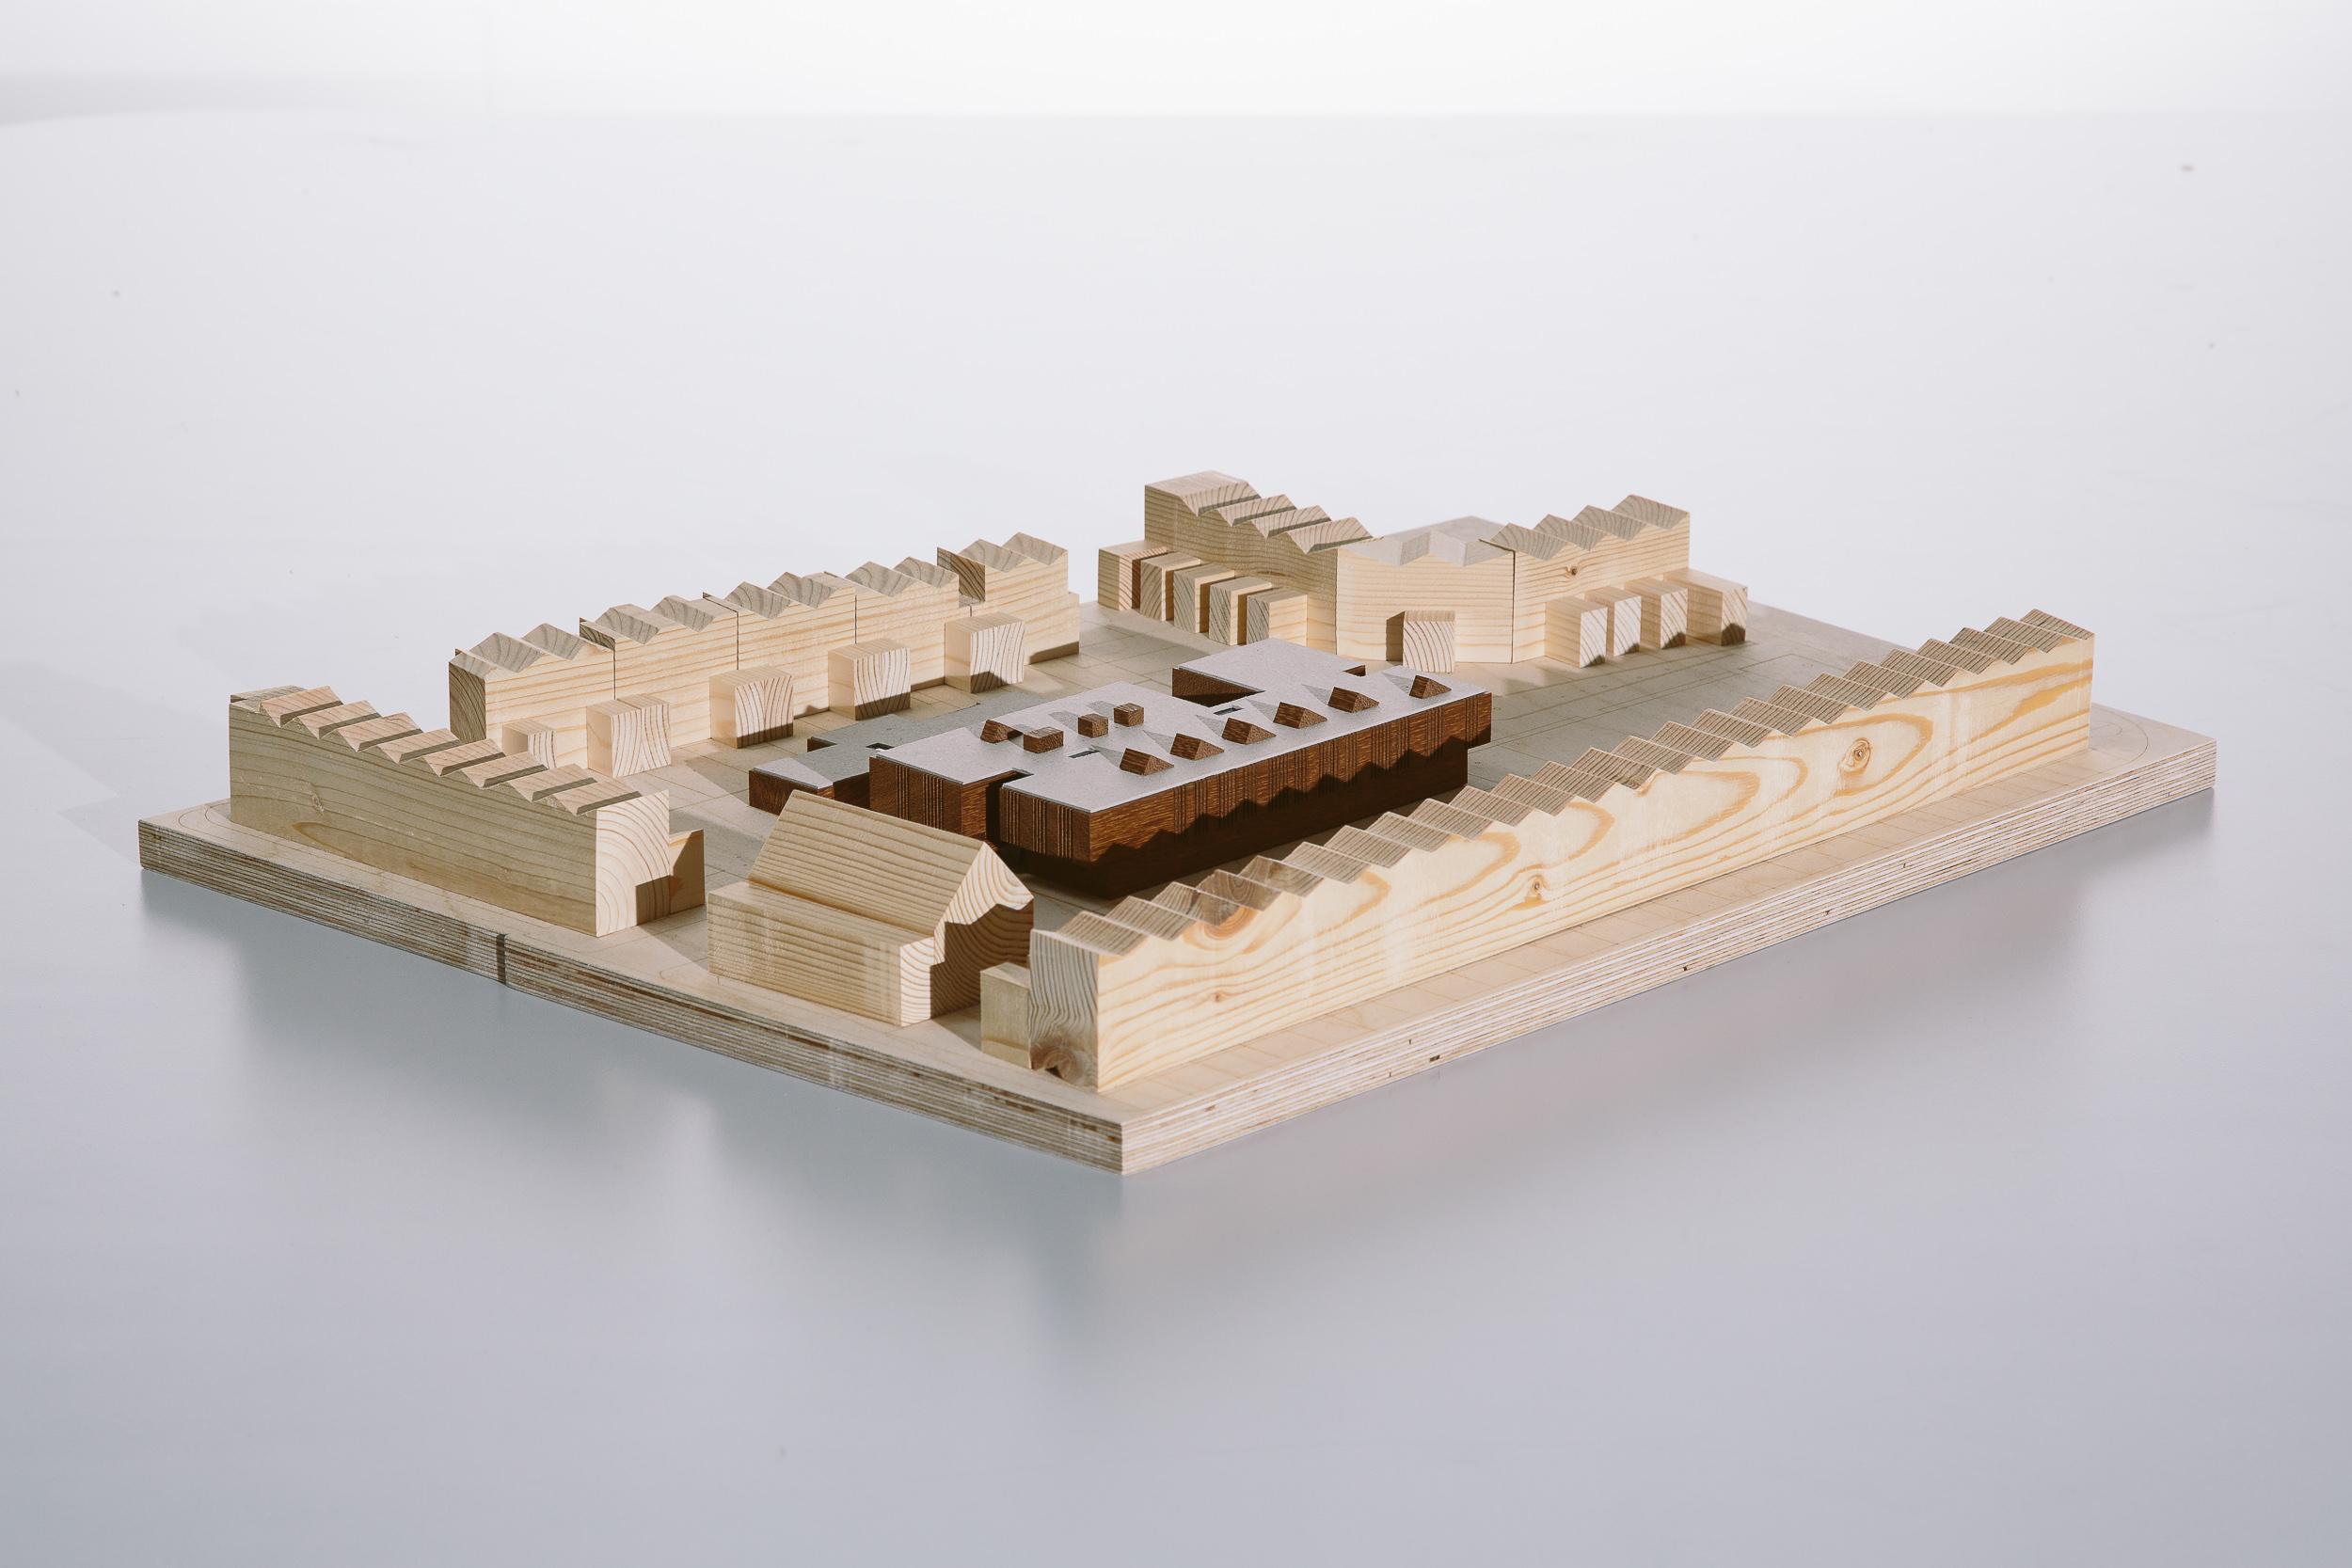 Downey-st-Arch-model-03.jpg